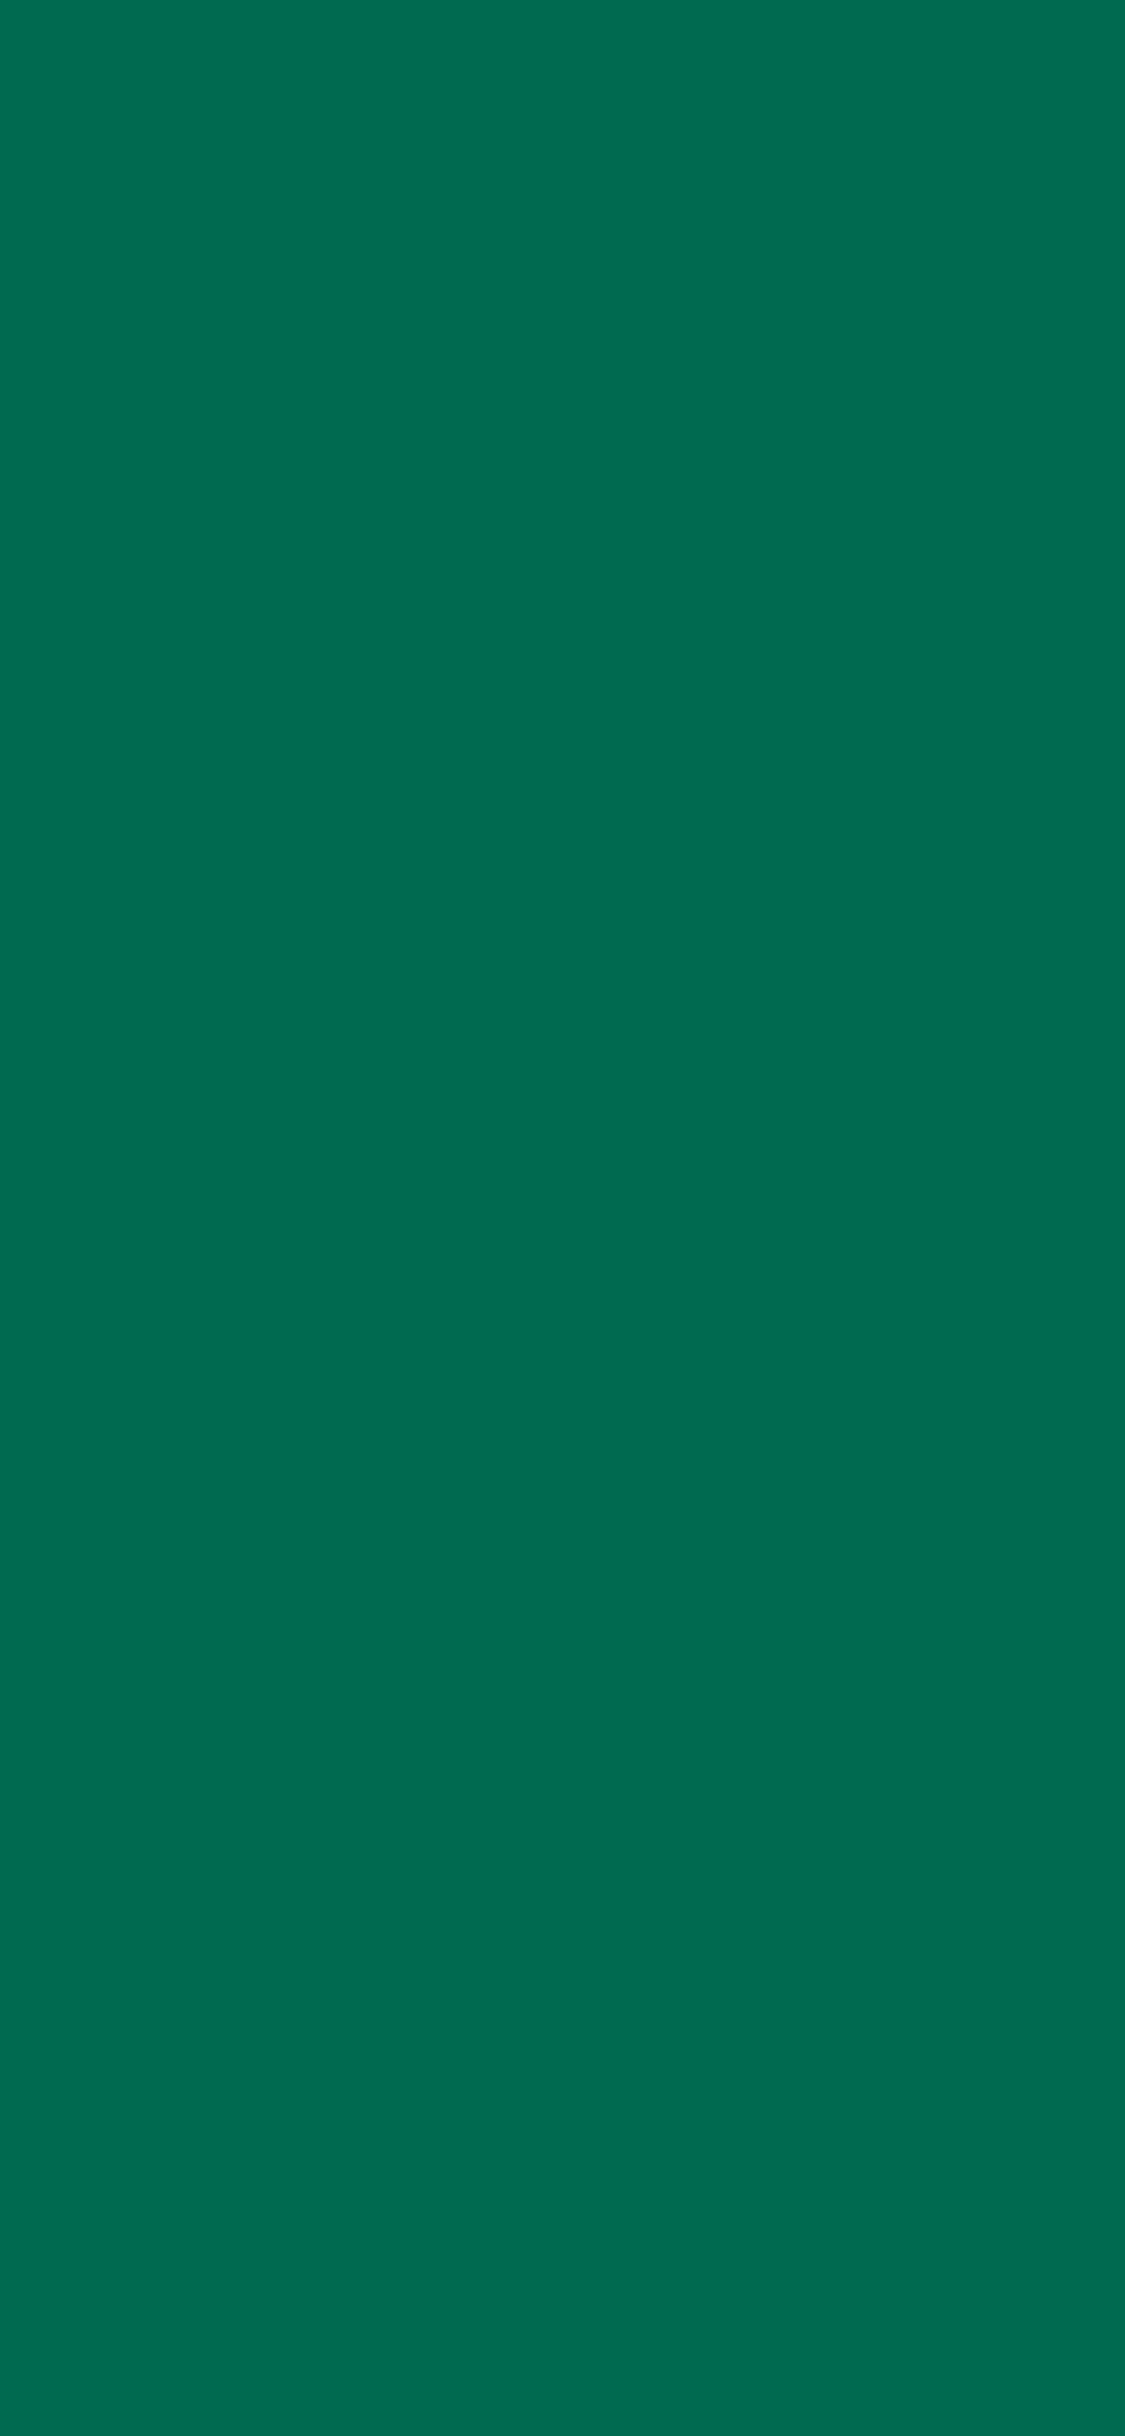 1125x2436 Bottle Green Solid Color Background